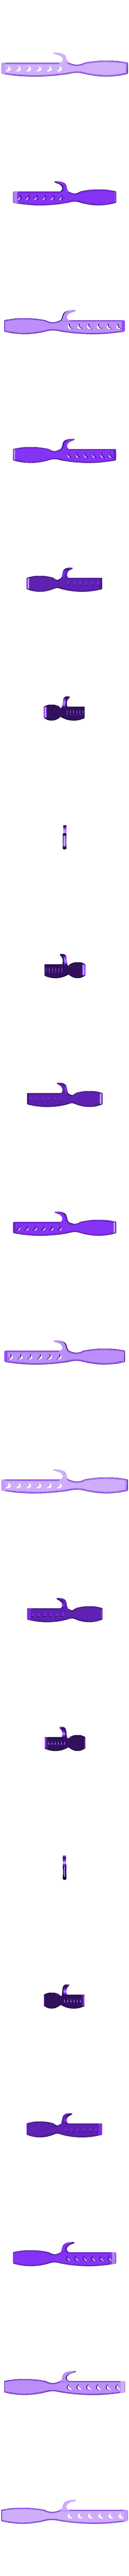 Paint Mixer.stl Download STL file Manual Paint mixer • 3D printing design, ludovic_gauthier